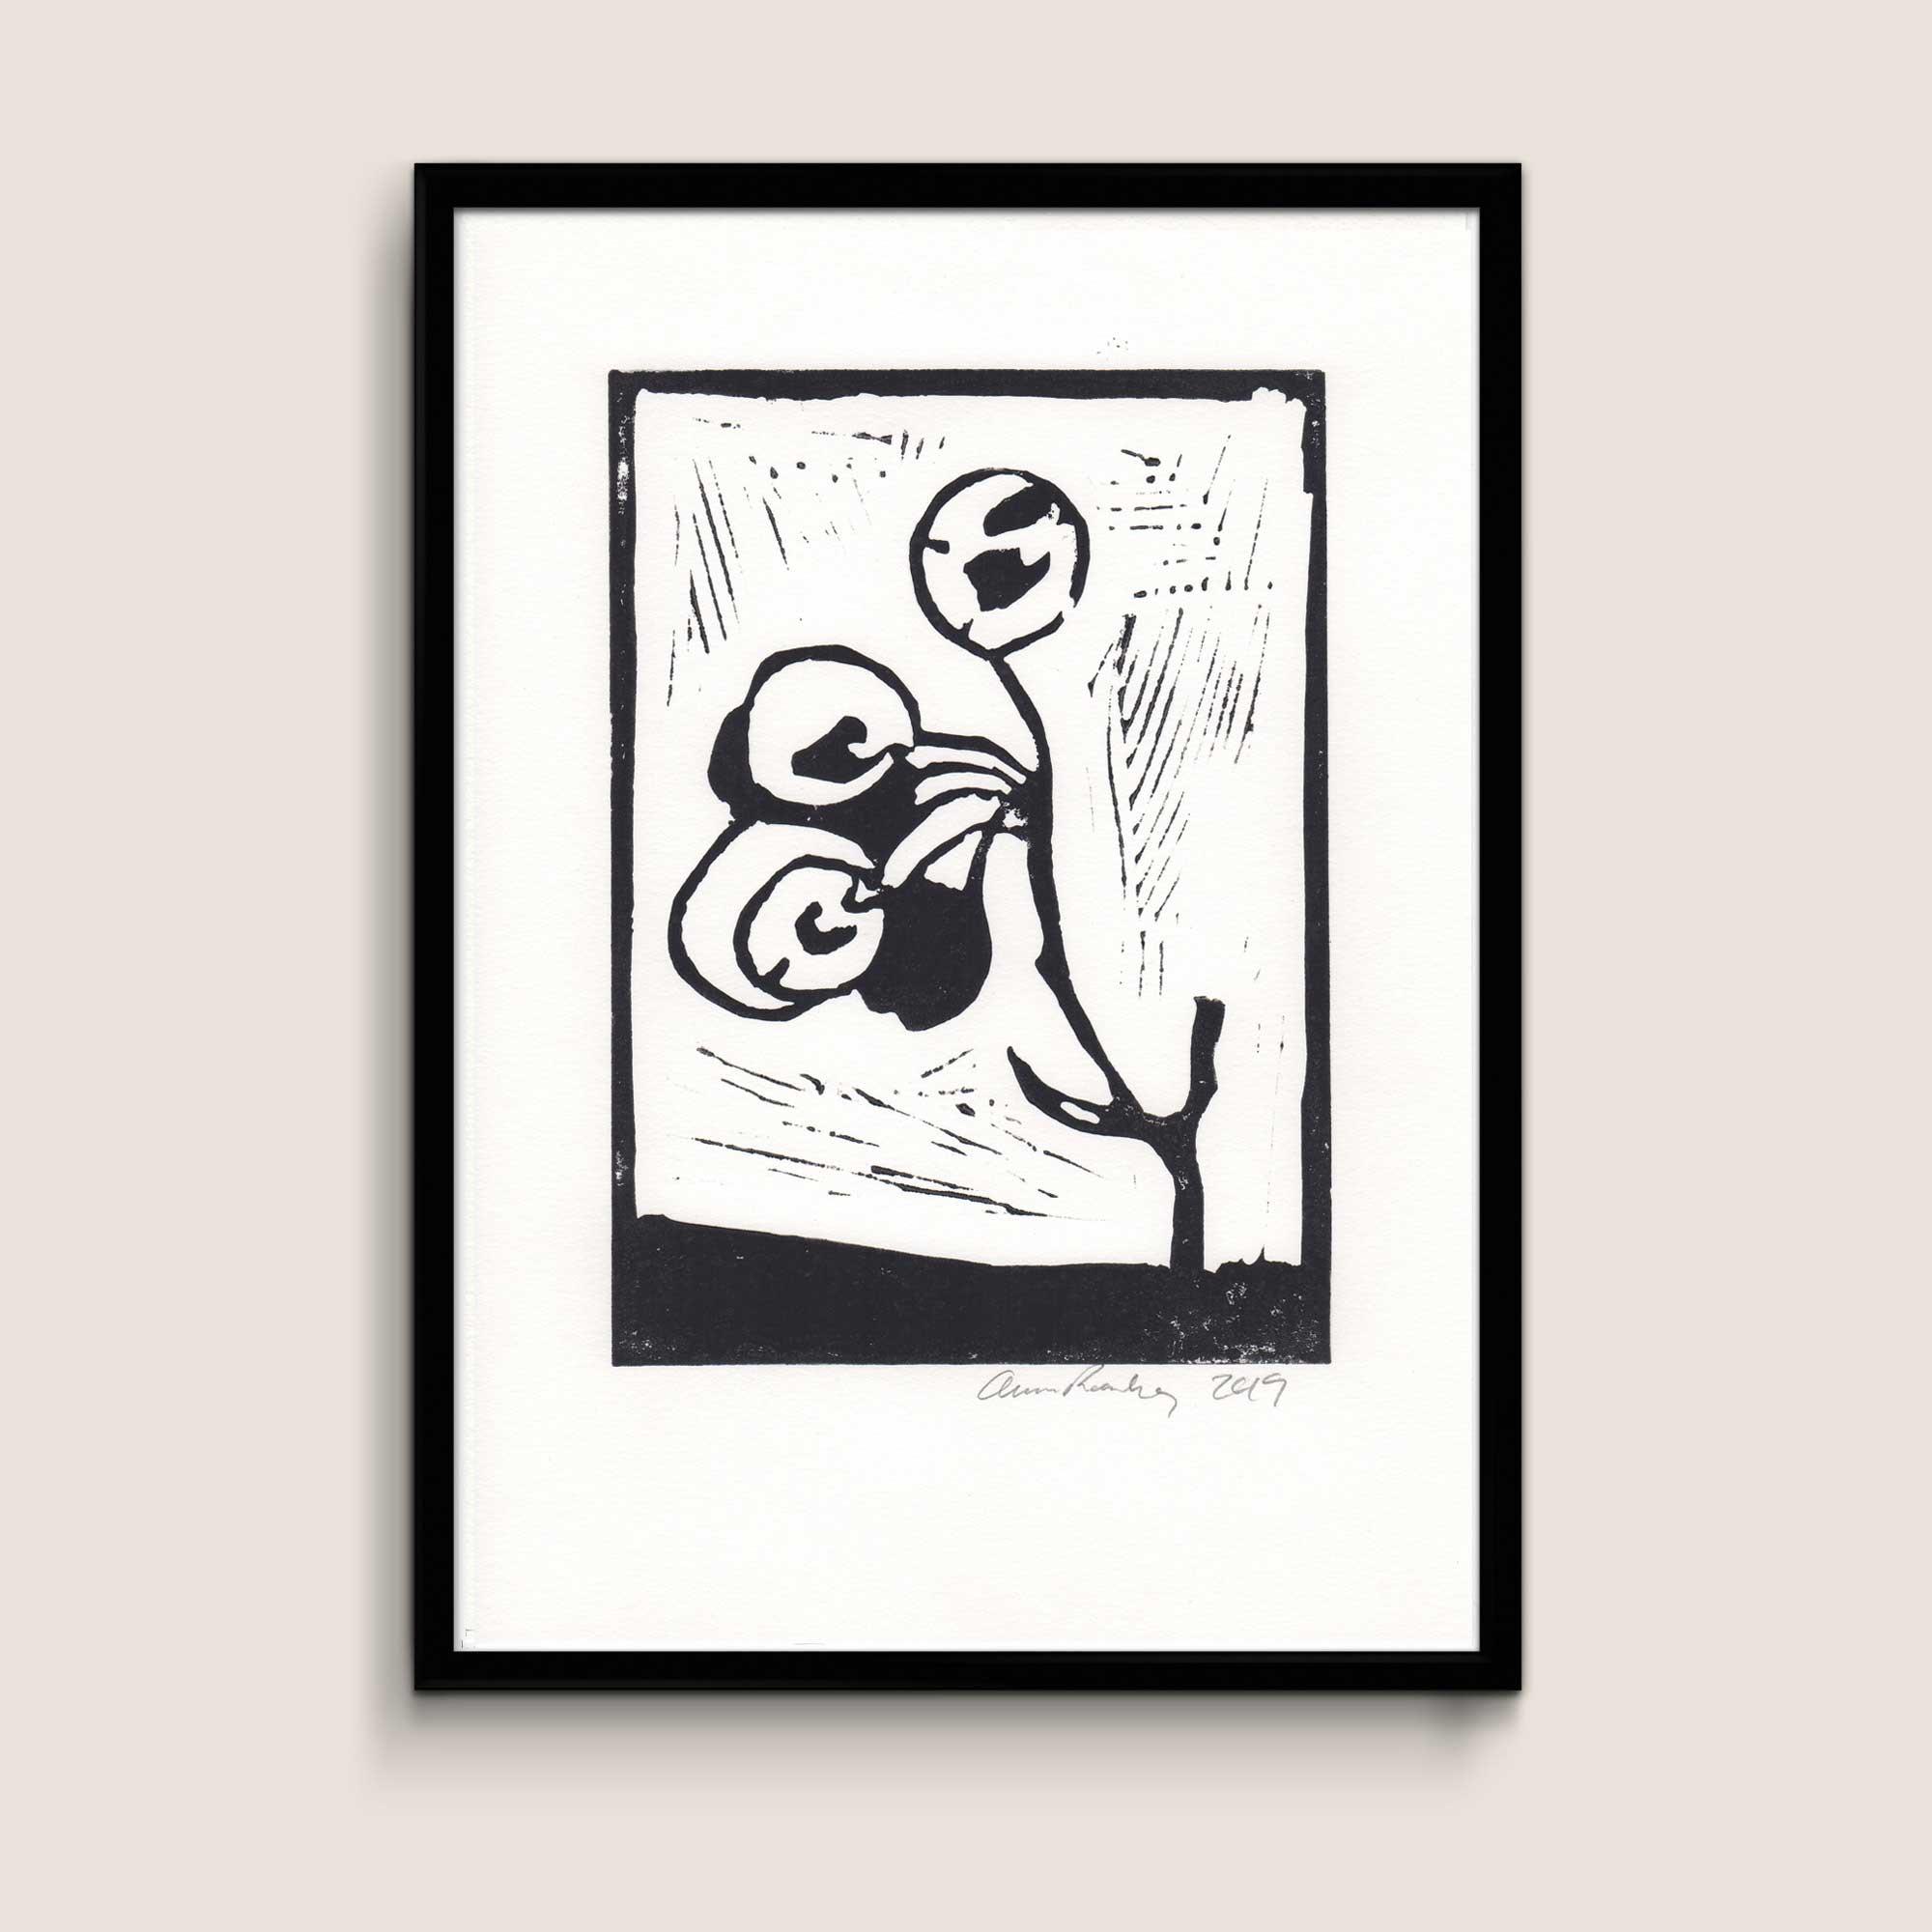 Manna, black, A4 size linocut by Anne Rosenberg, RosenbergCph